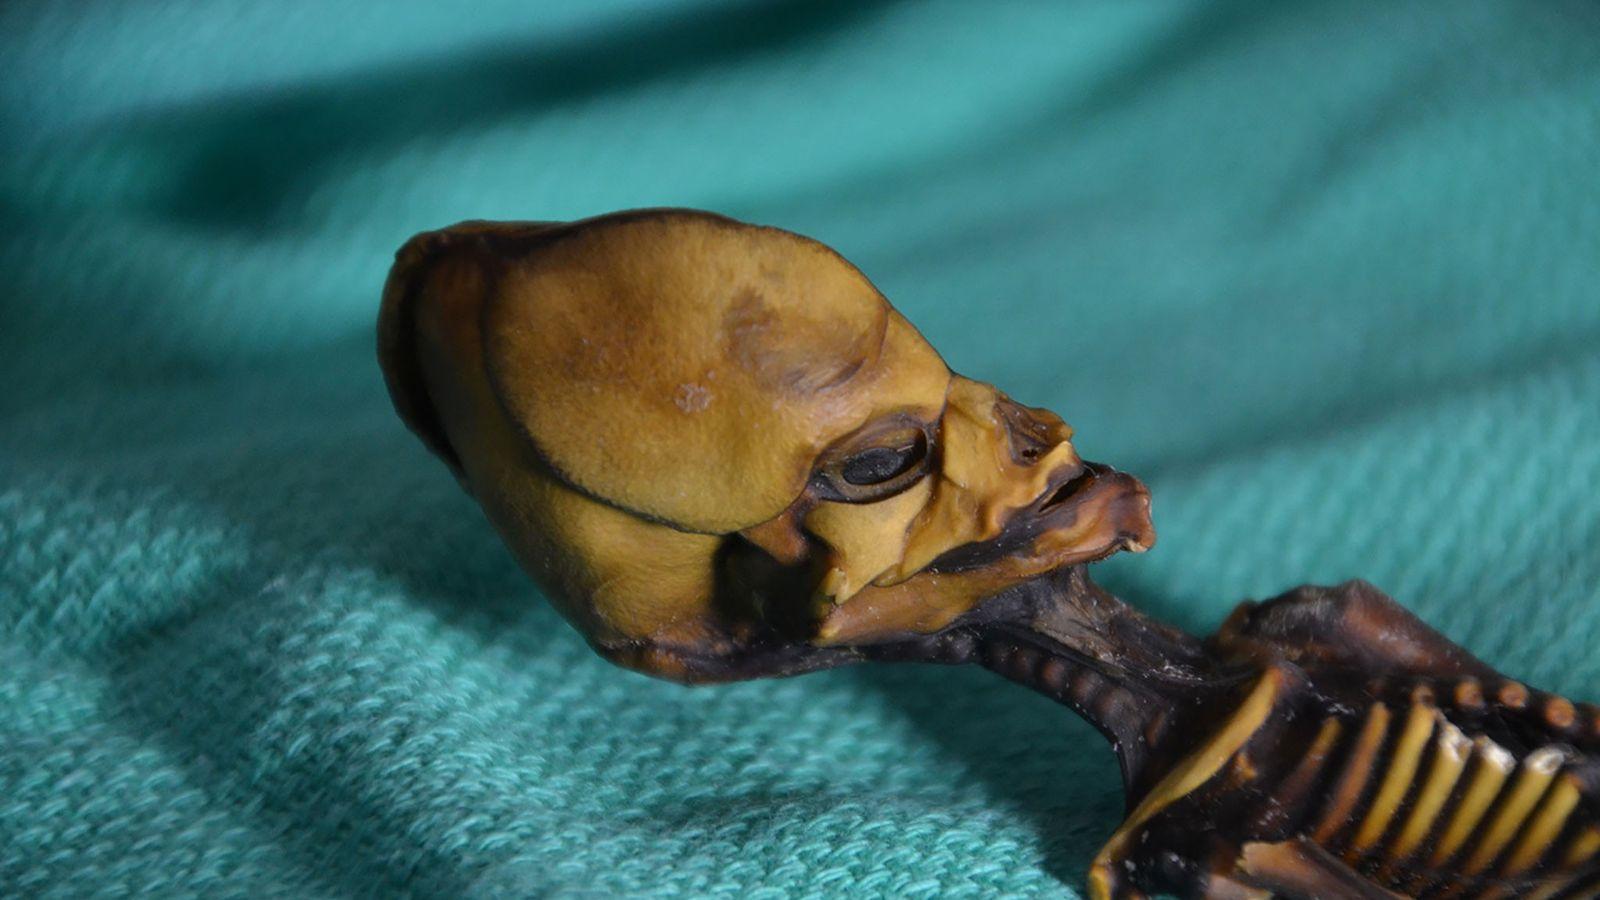 Ata, a múmia de quinze centímetros encontrada no deserto de Atacama